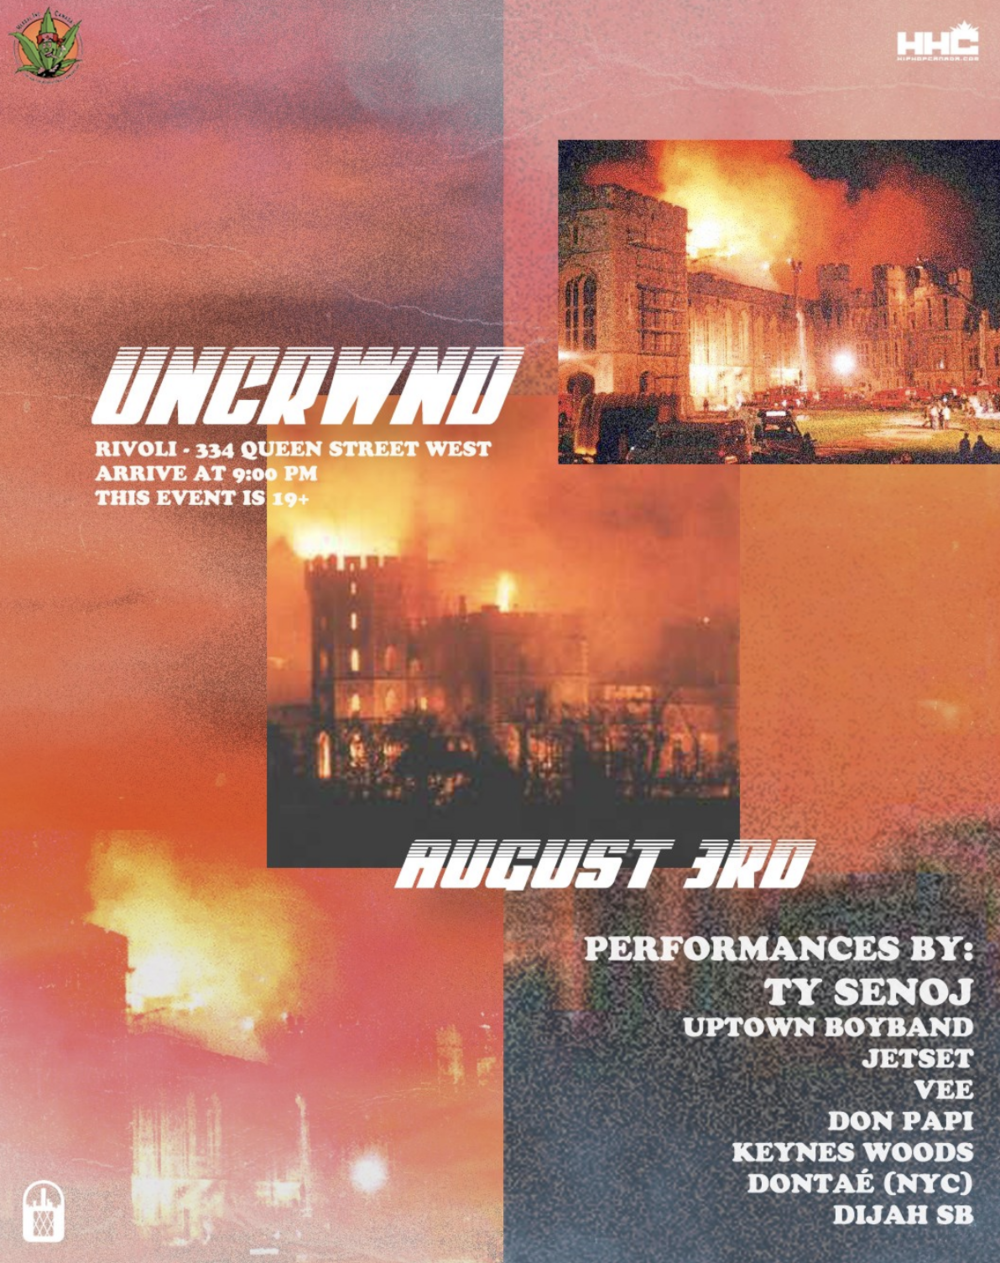 UNCRWND VOL. 8Ty SenojUptown Boy BandJETSETVeeDon PapiKeynes WoodsDontaéDijah SB - COVER: $20 ADV / $25 DOORMORE INFO